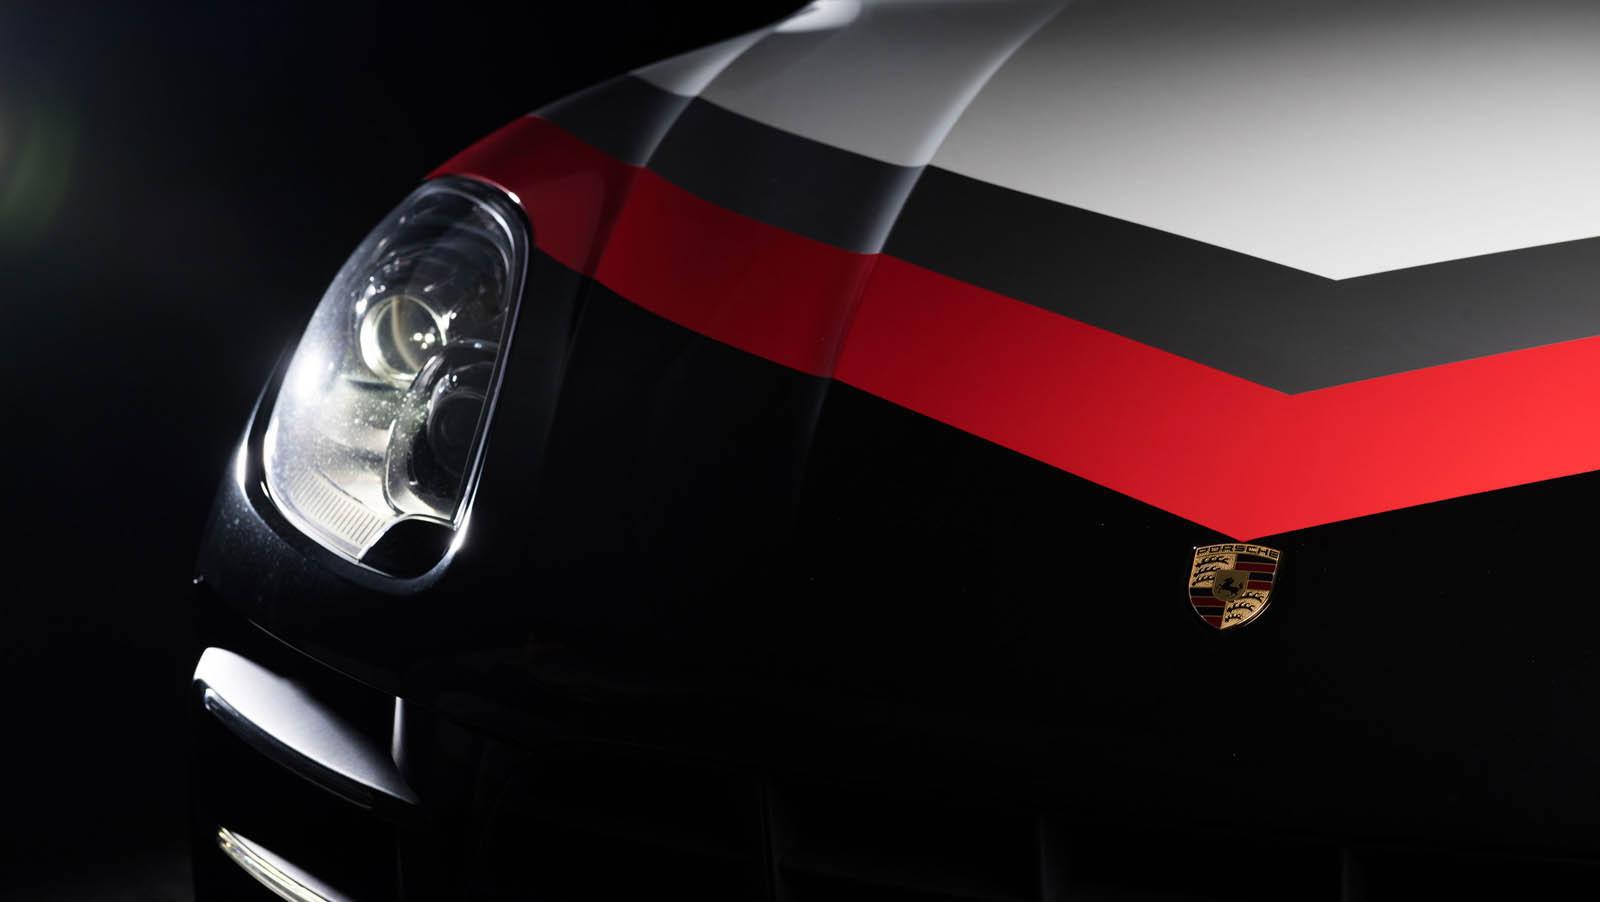 Porsche_Macan_Special_livery_06